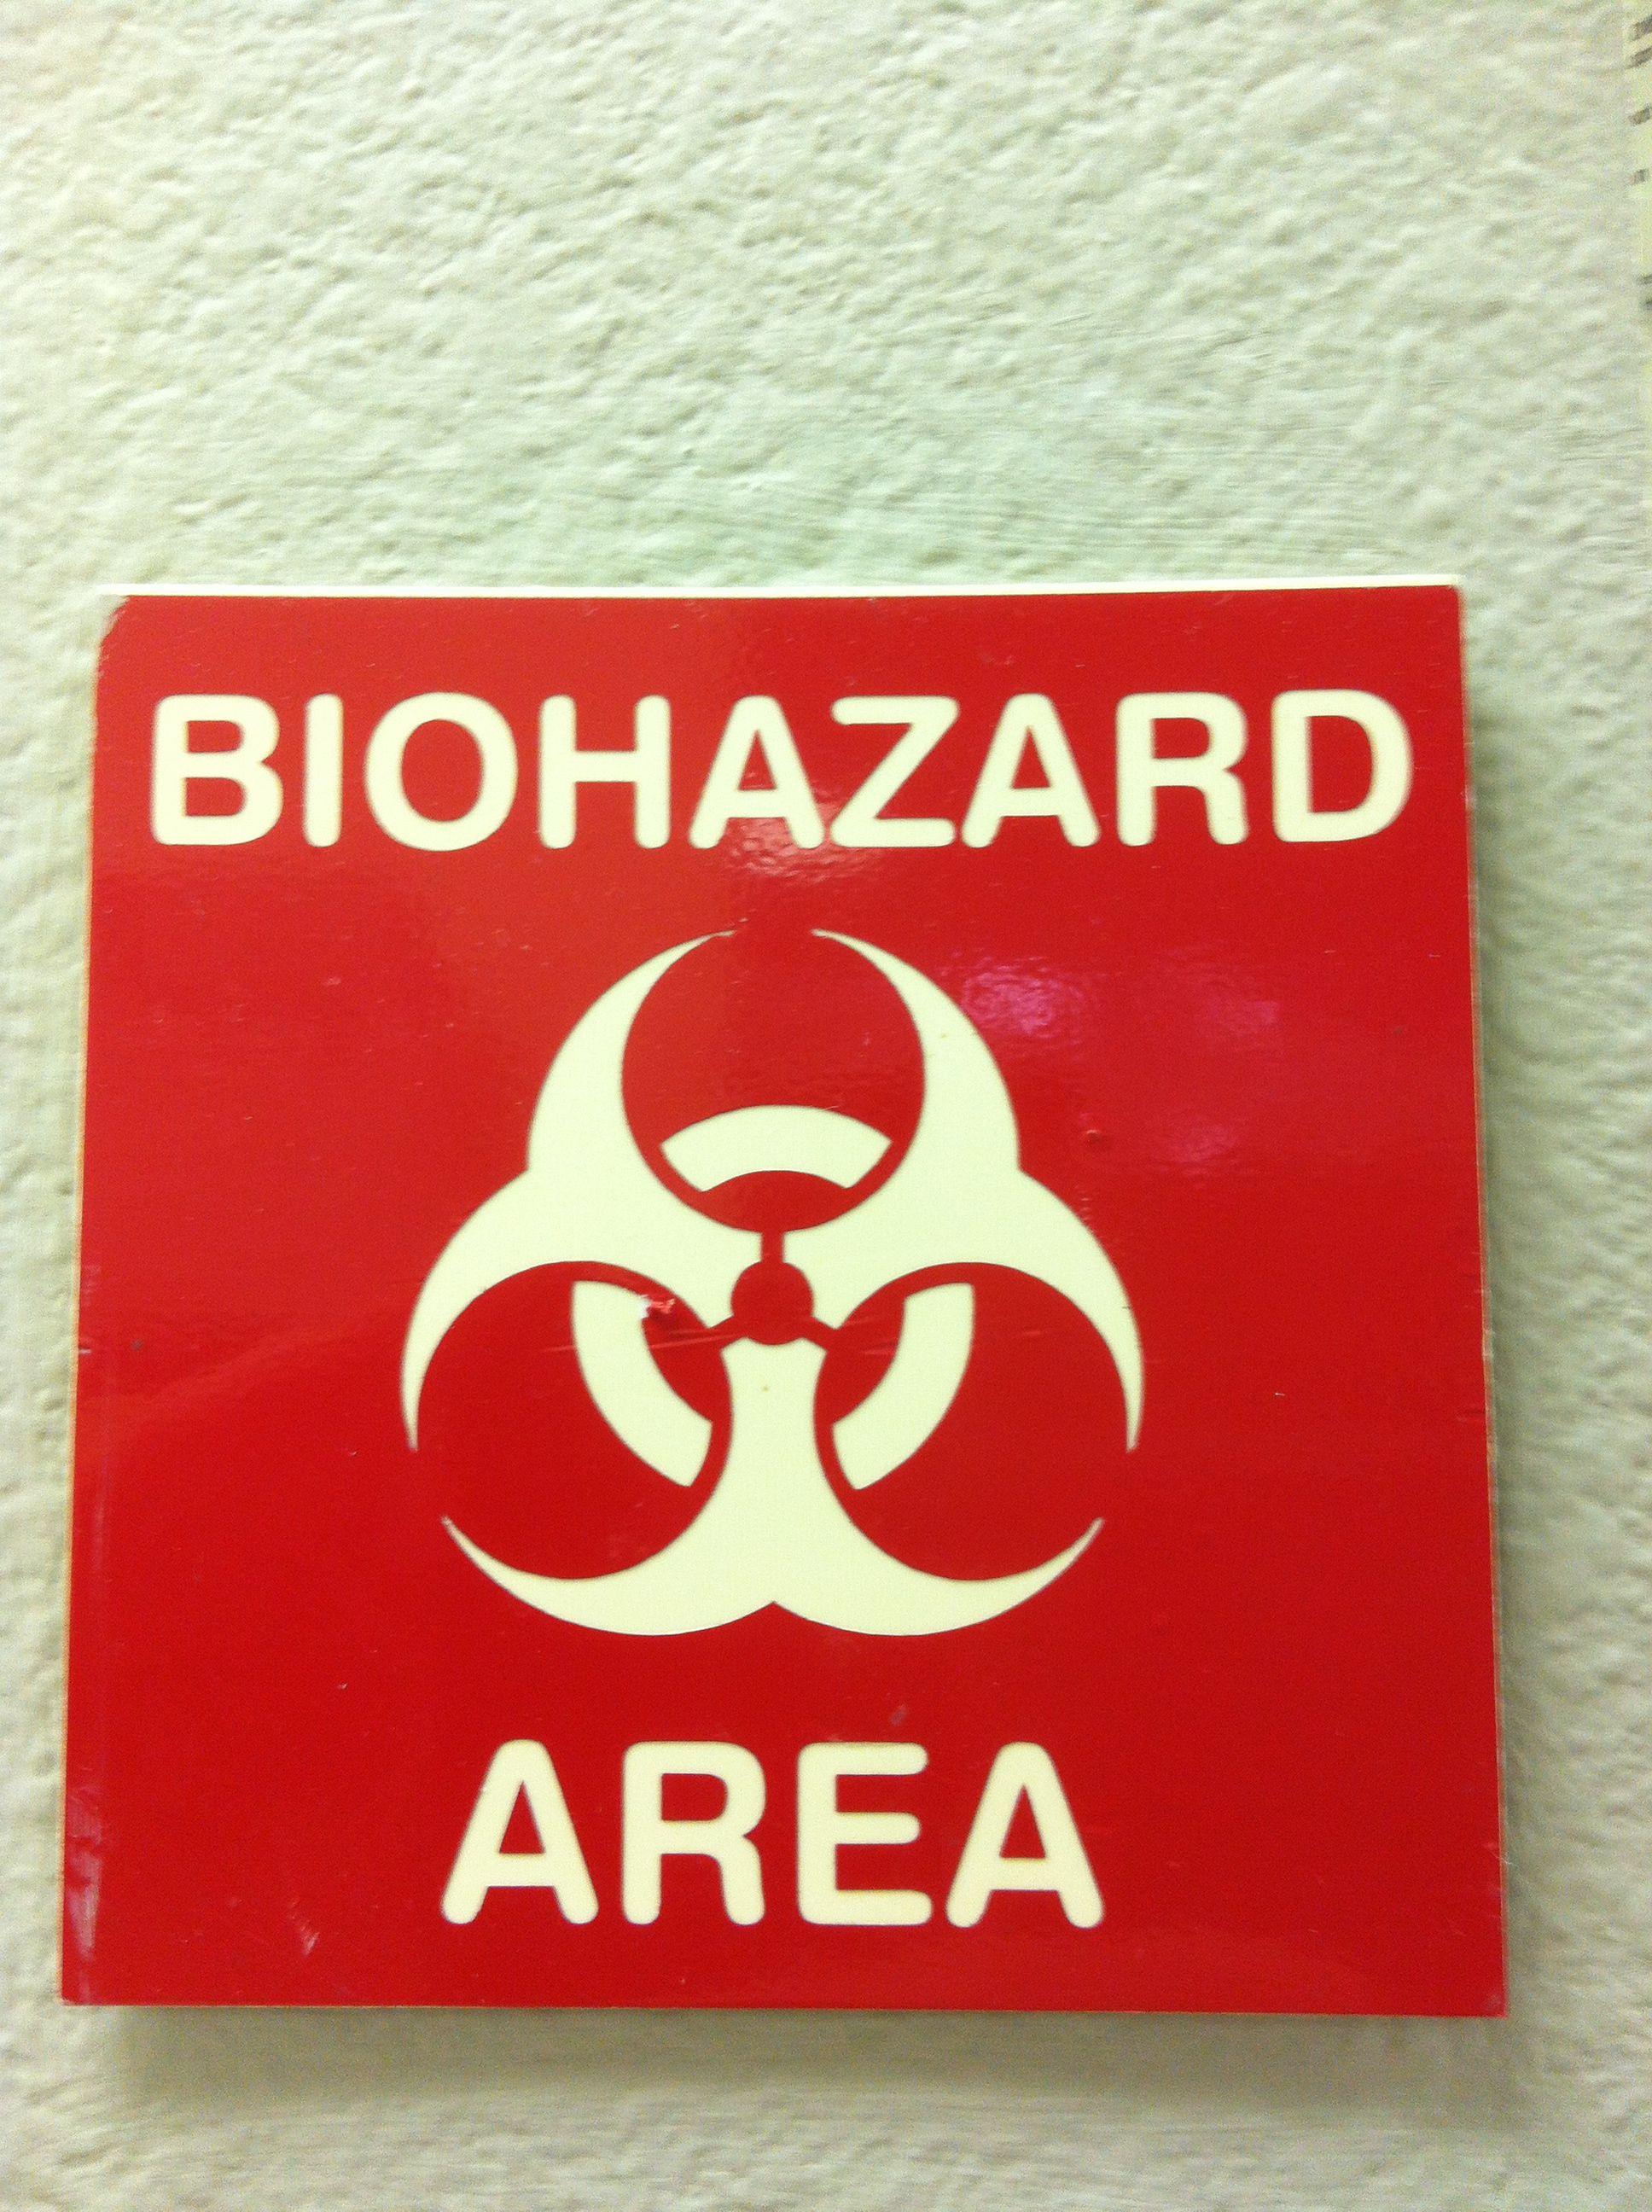 Biohazard sign Dental office